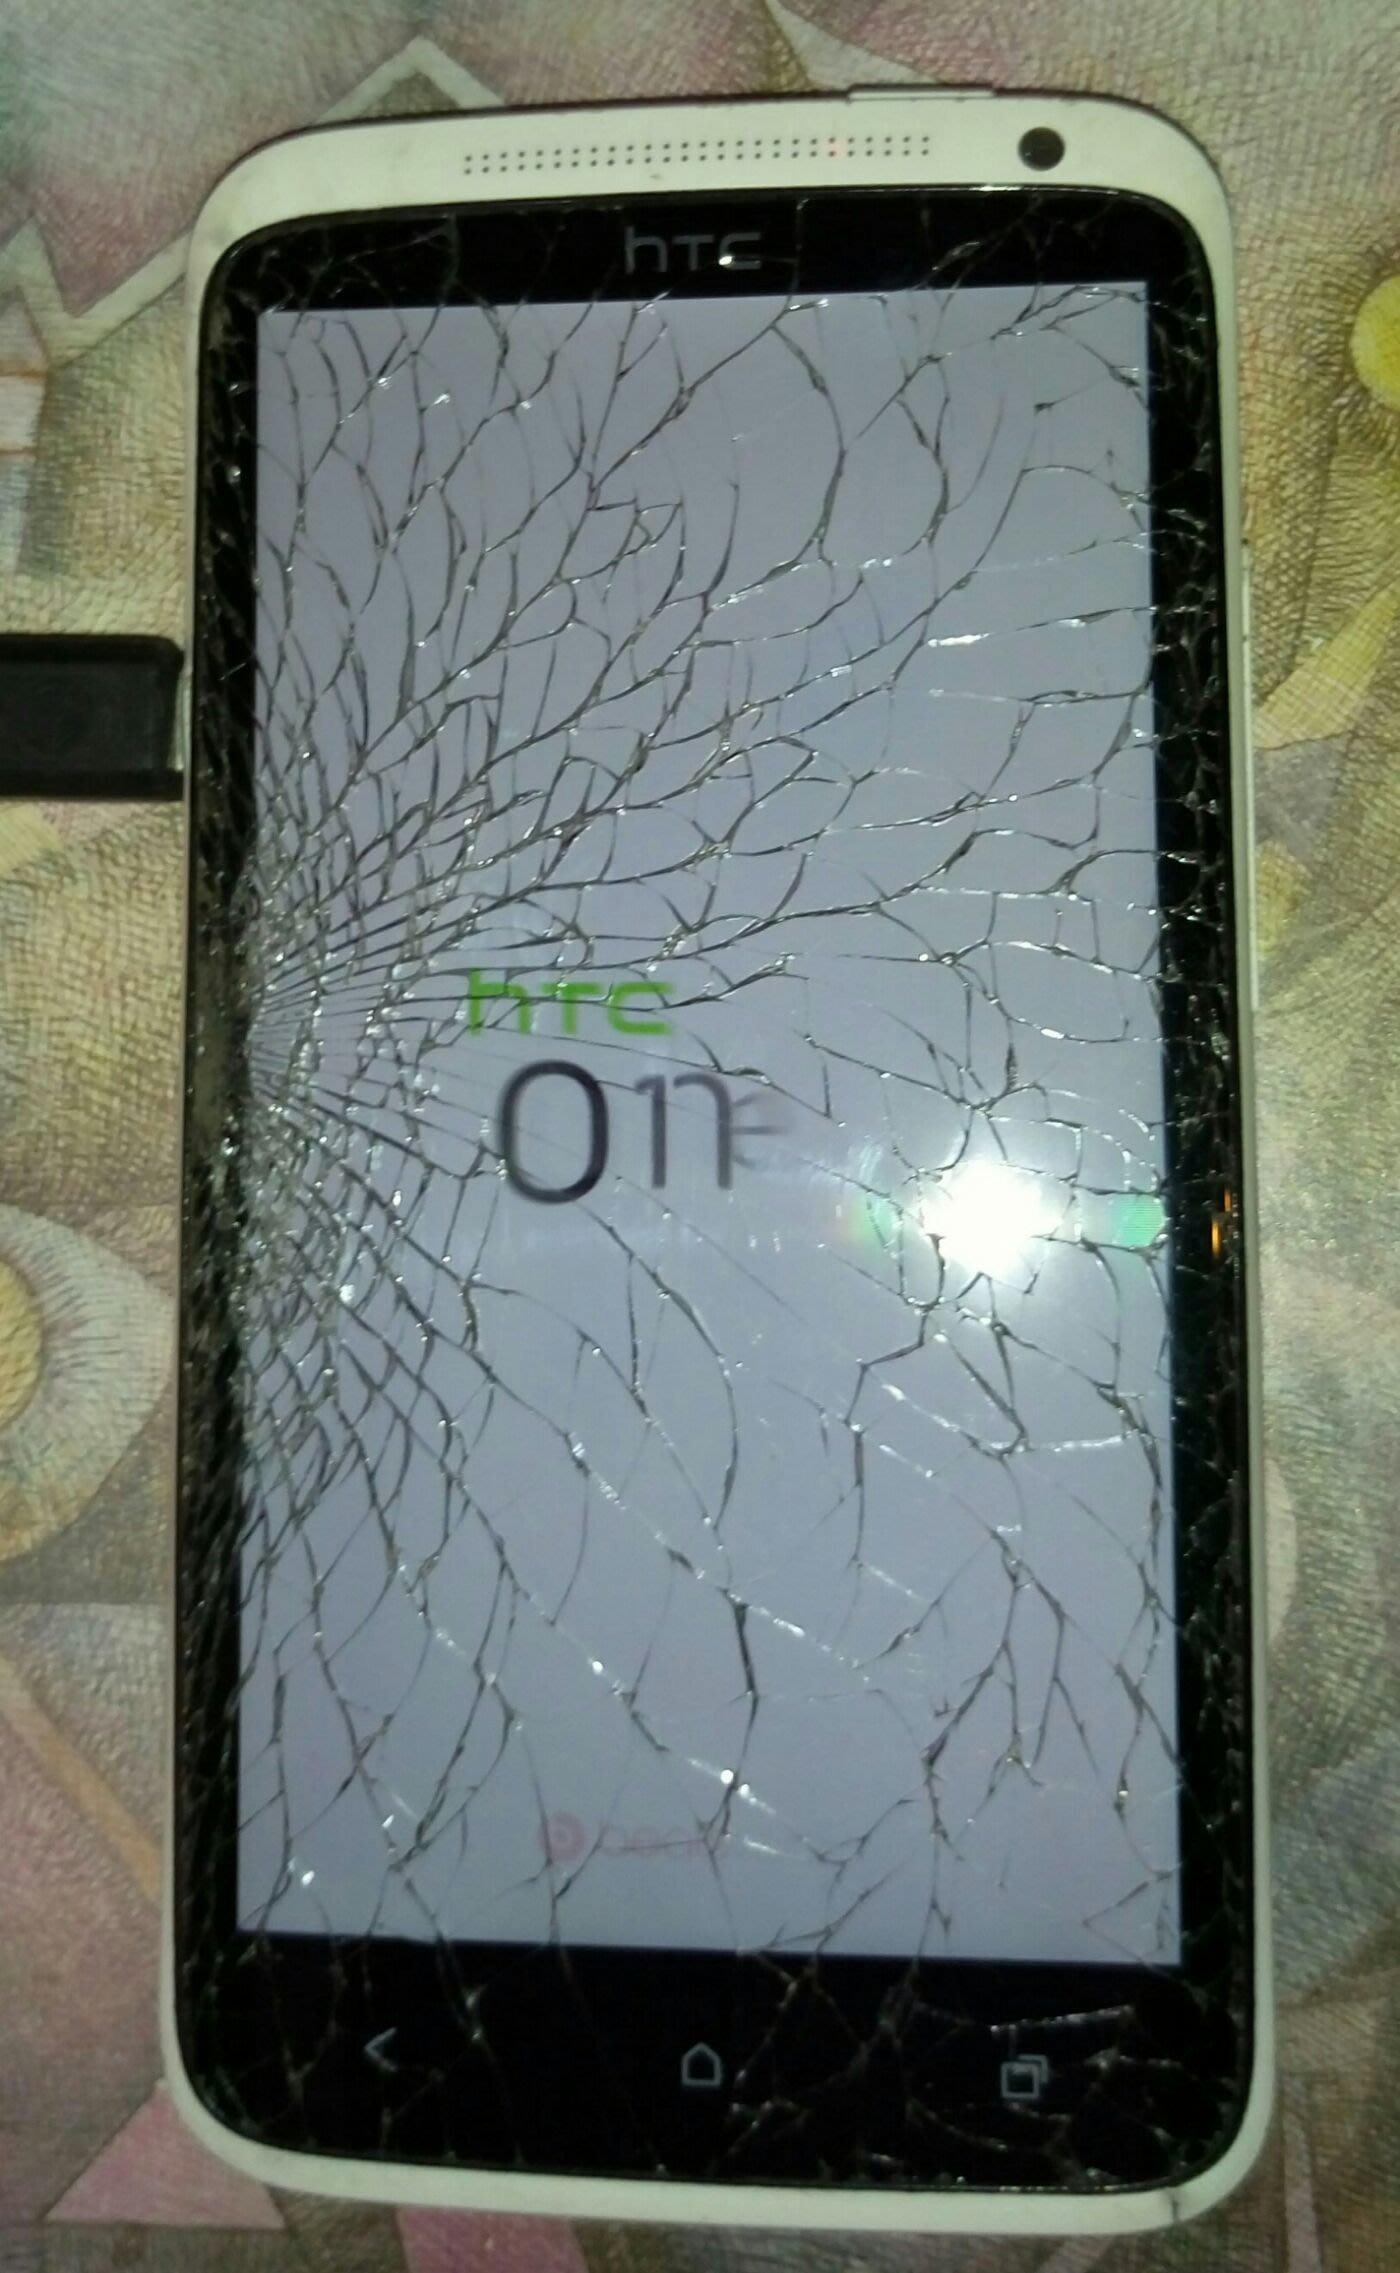 $【故障機 】HTC One X S720e『白色』 $$